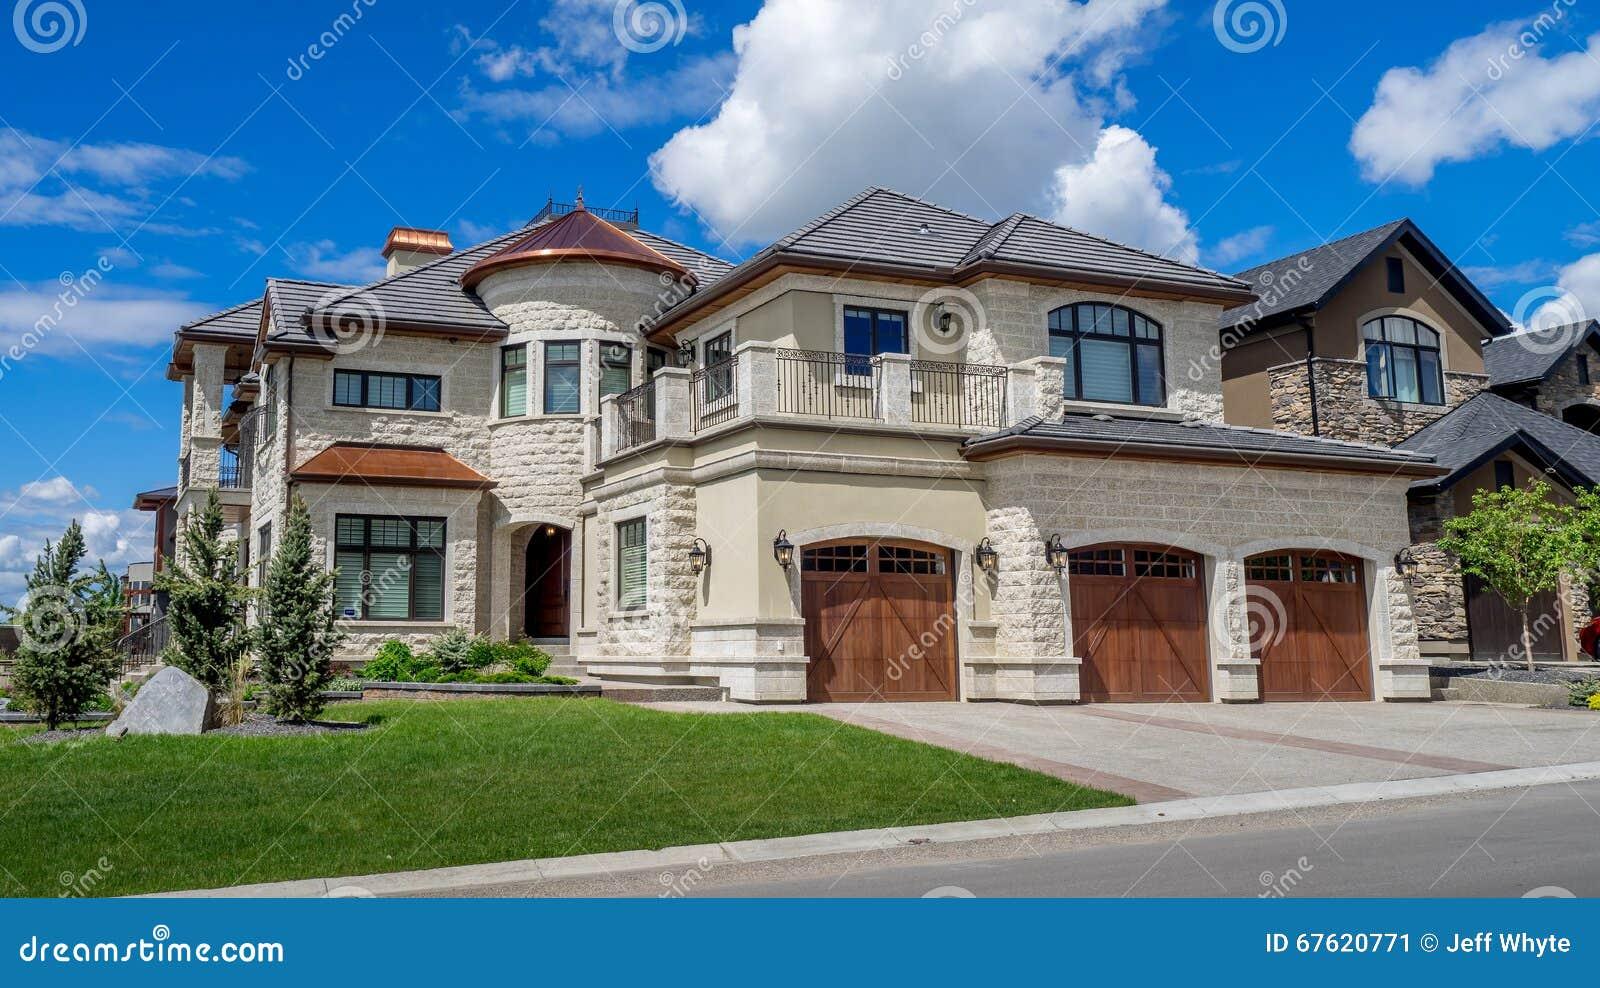 luxury house in calgary canada - Maison Canada